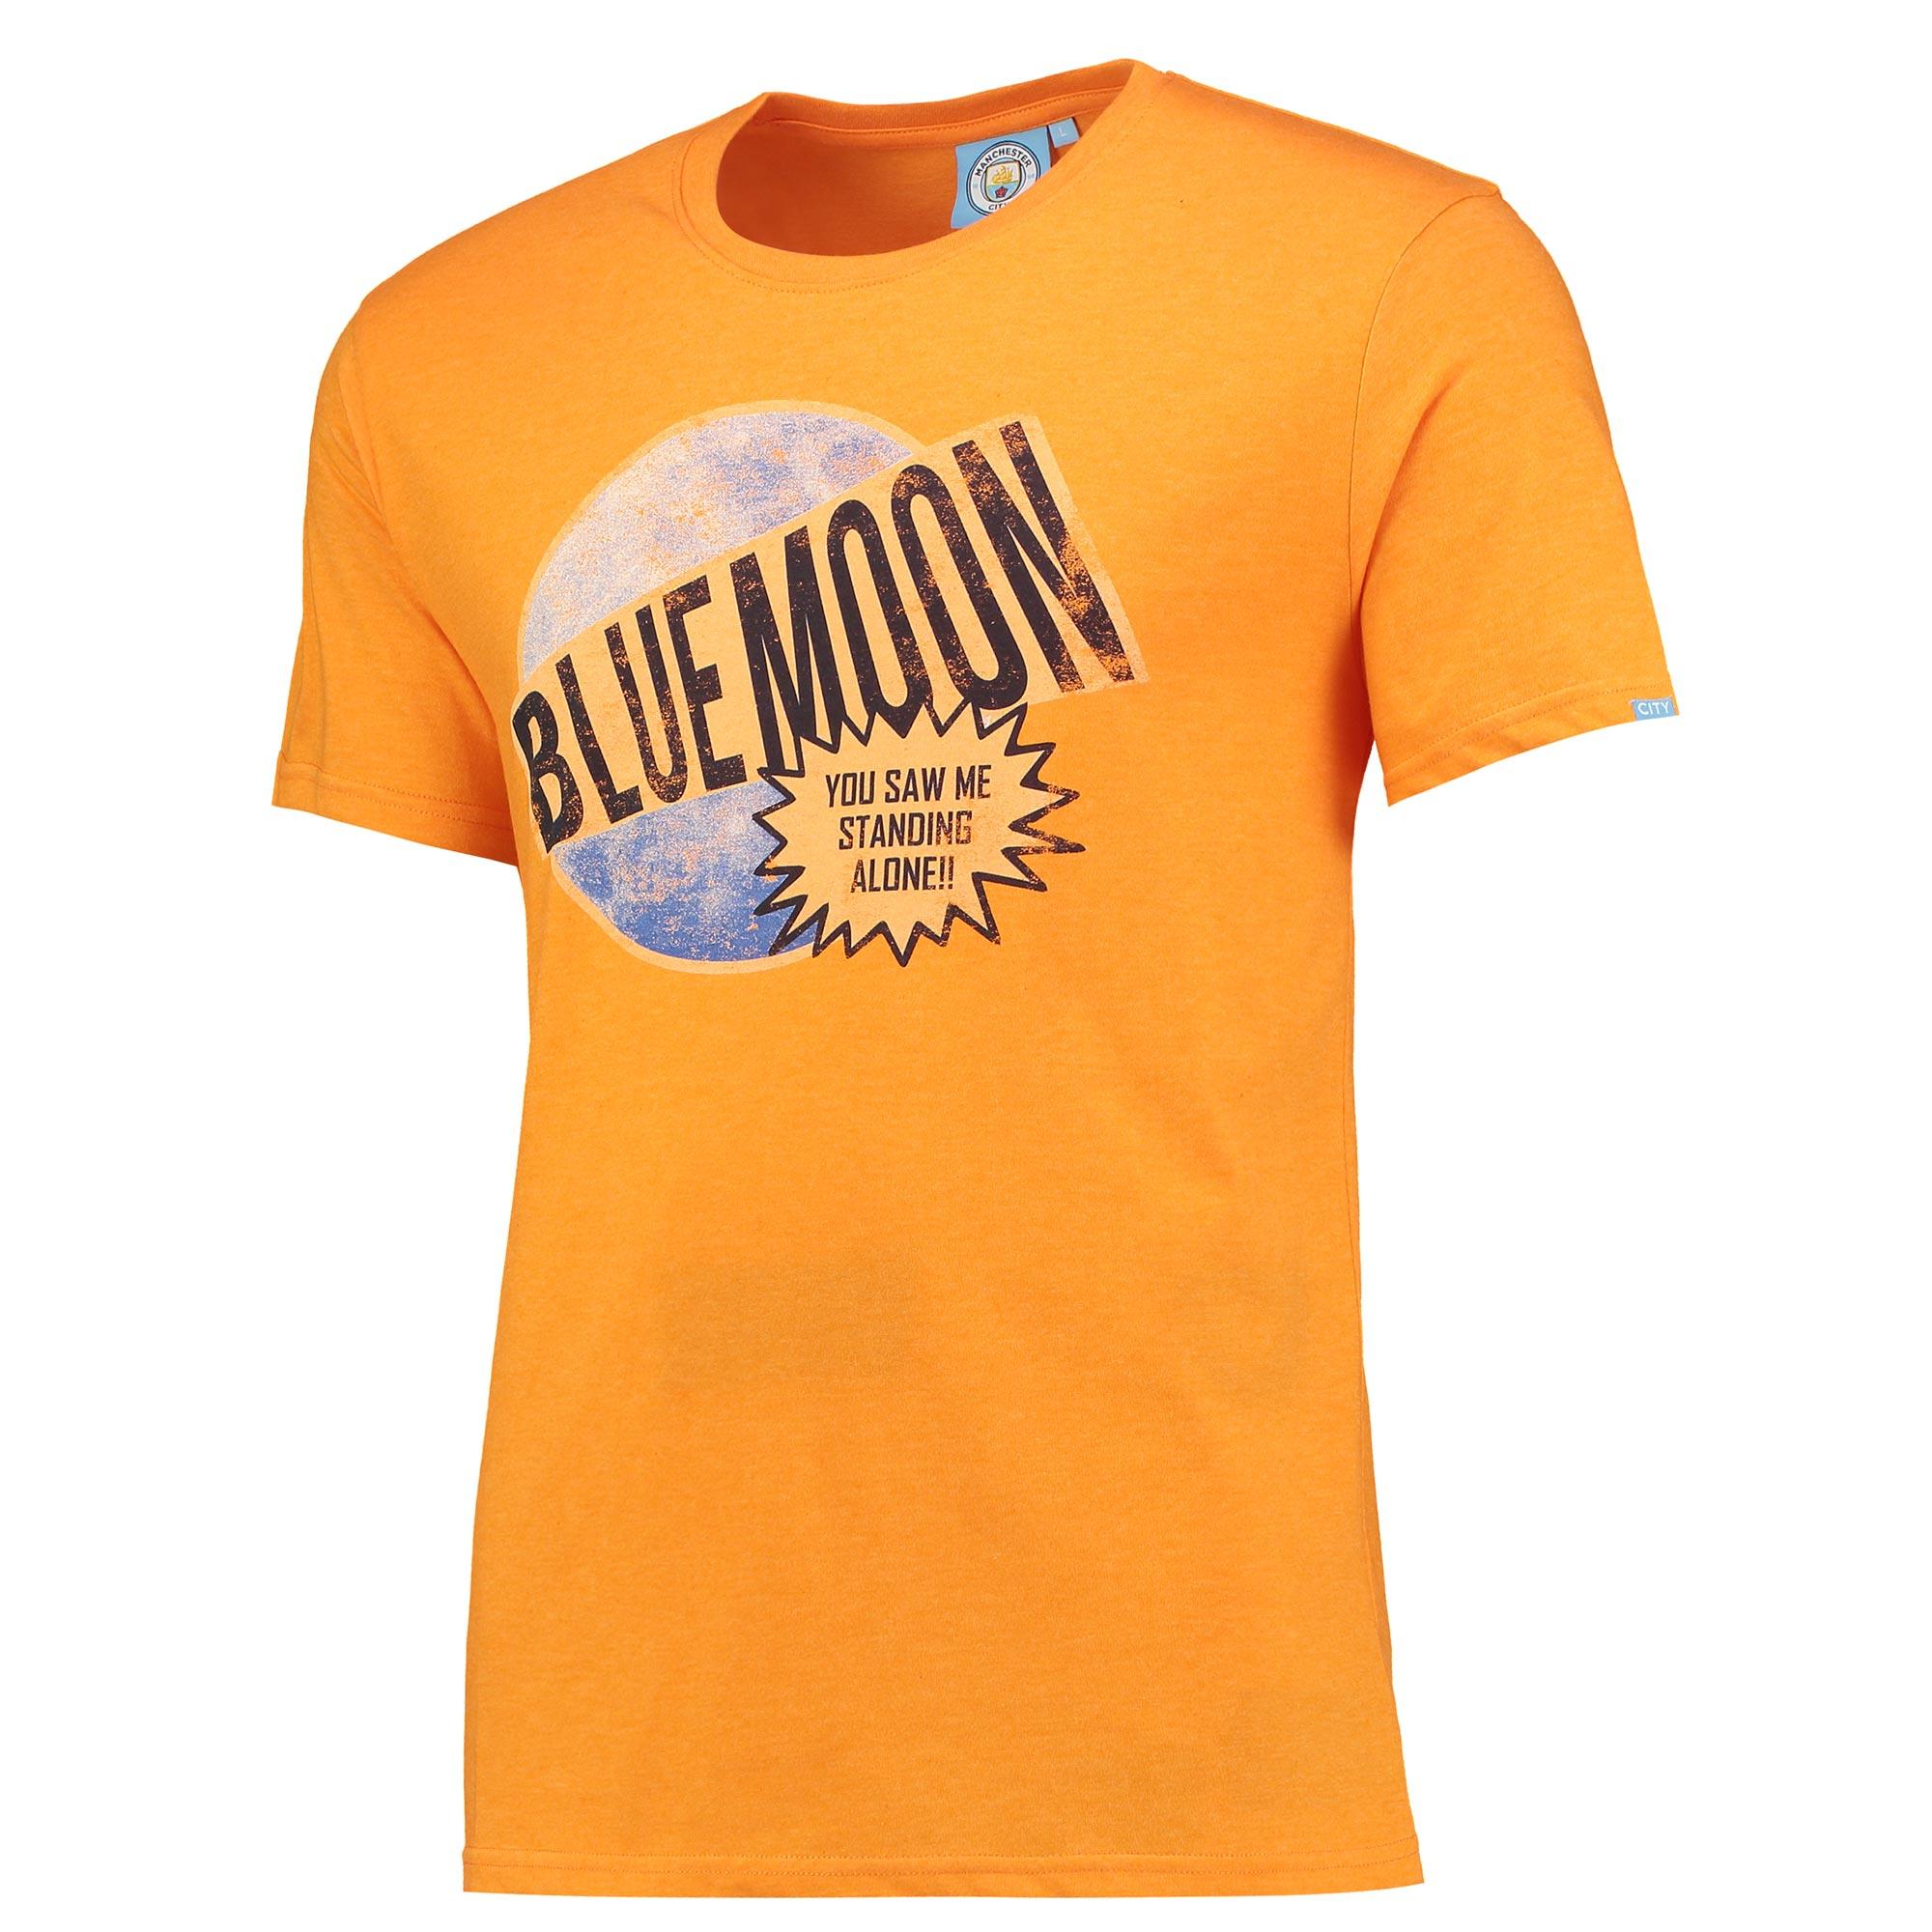 Manchester City Blue Moon T-Shirt - Orange